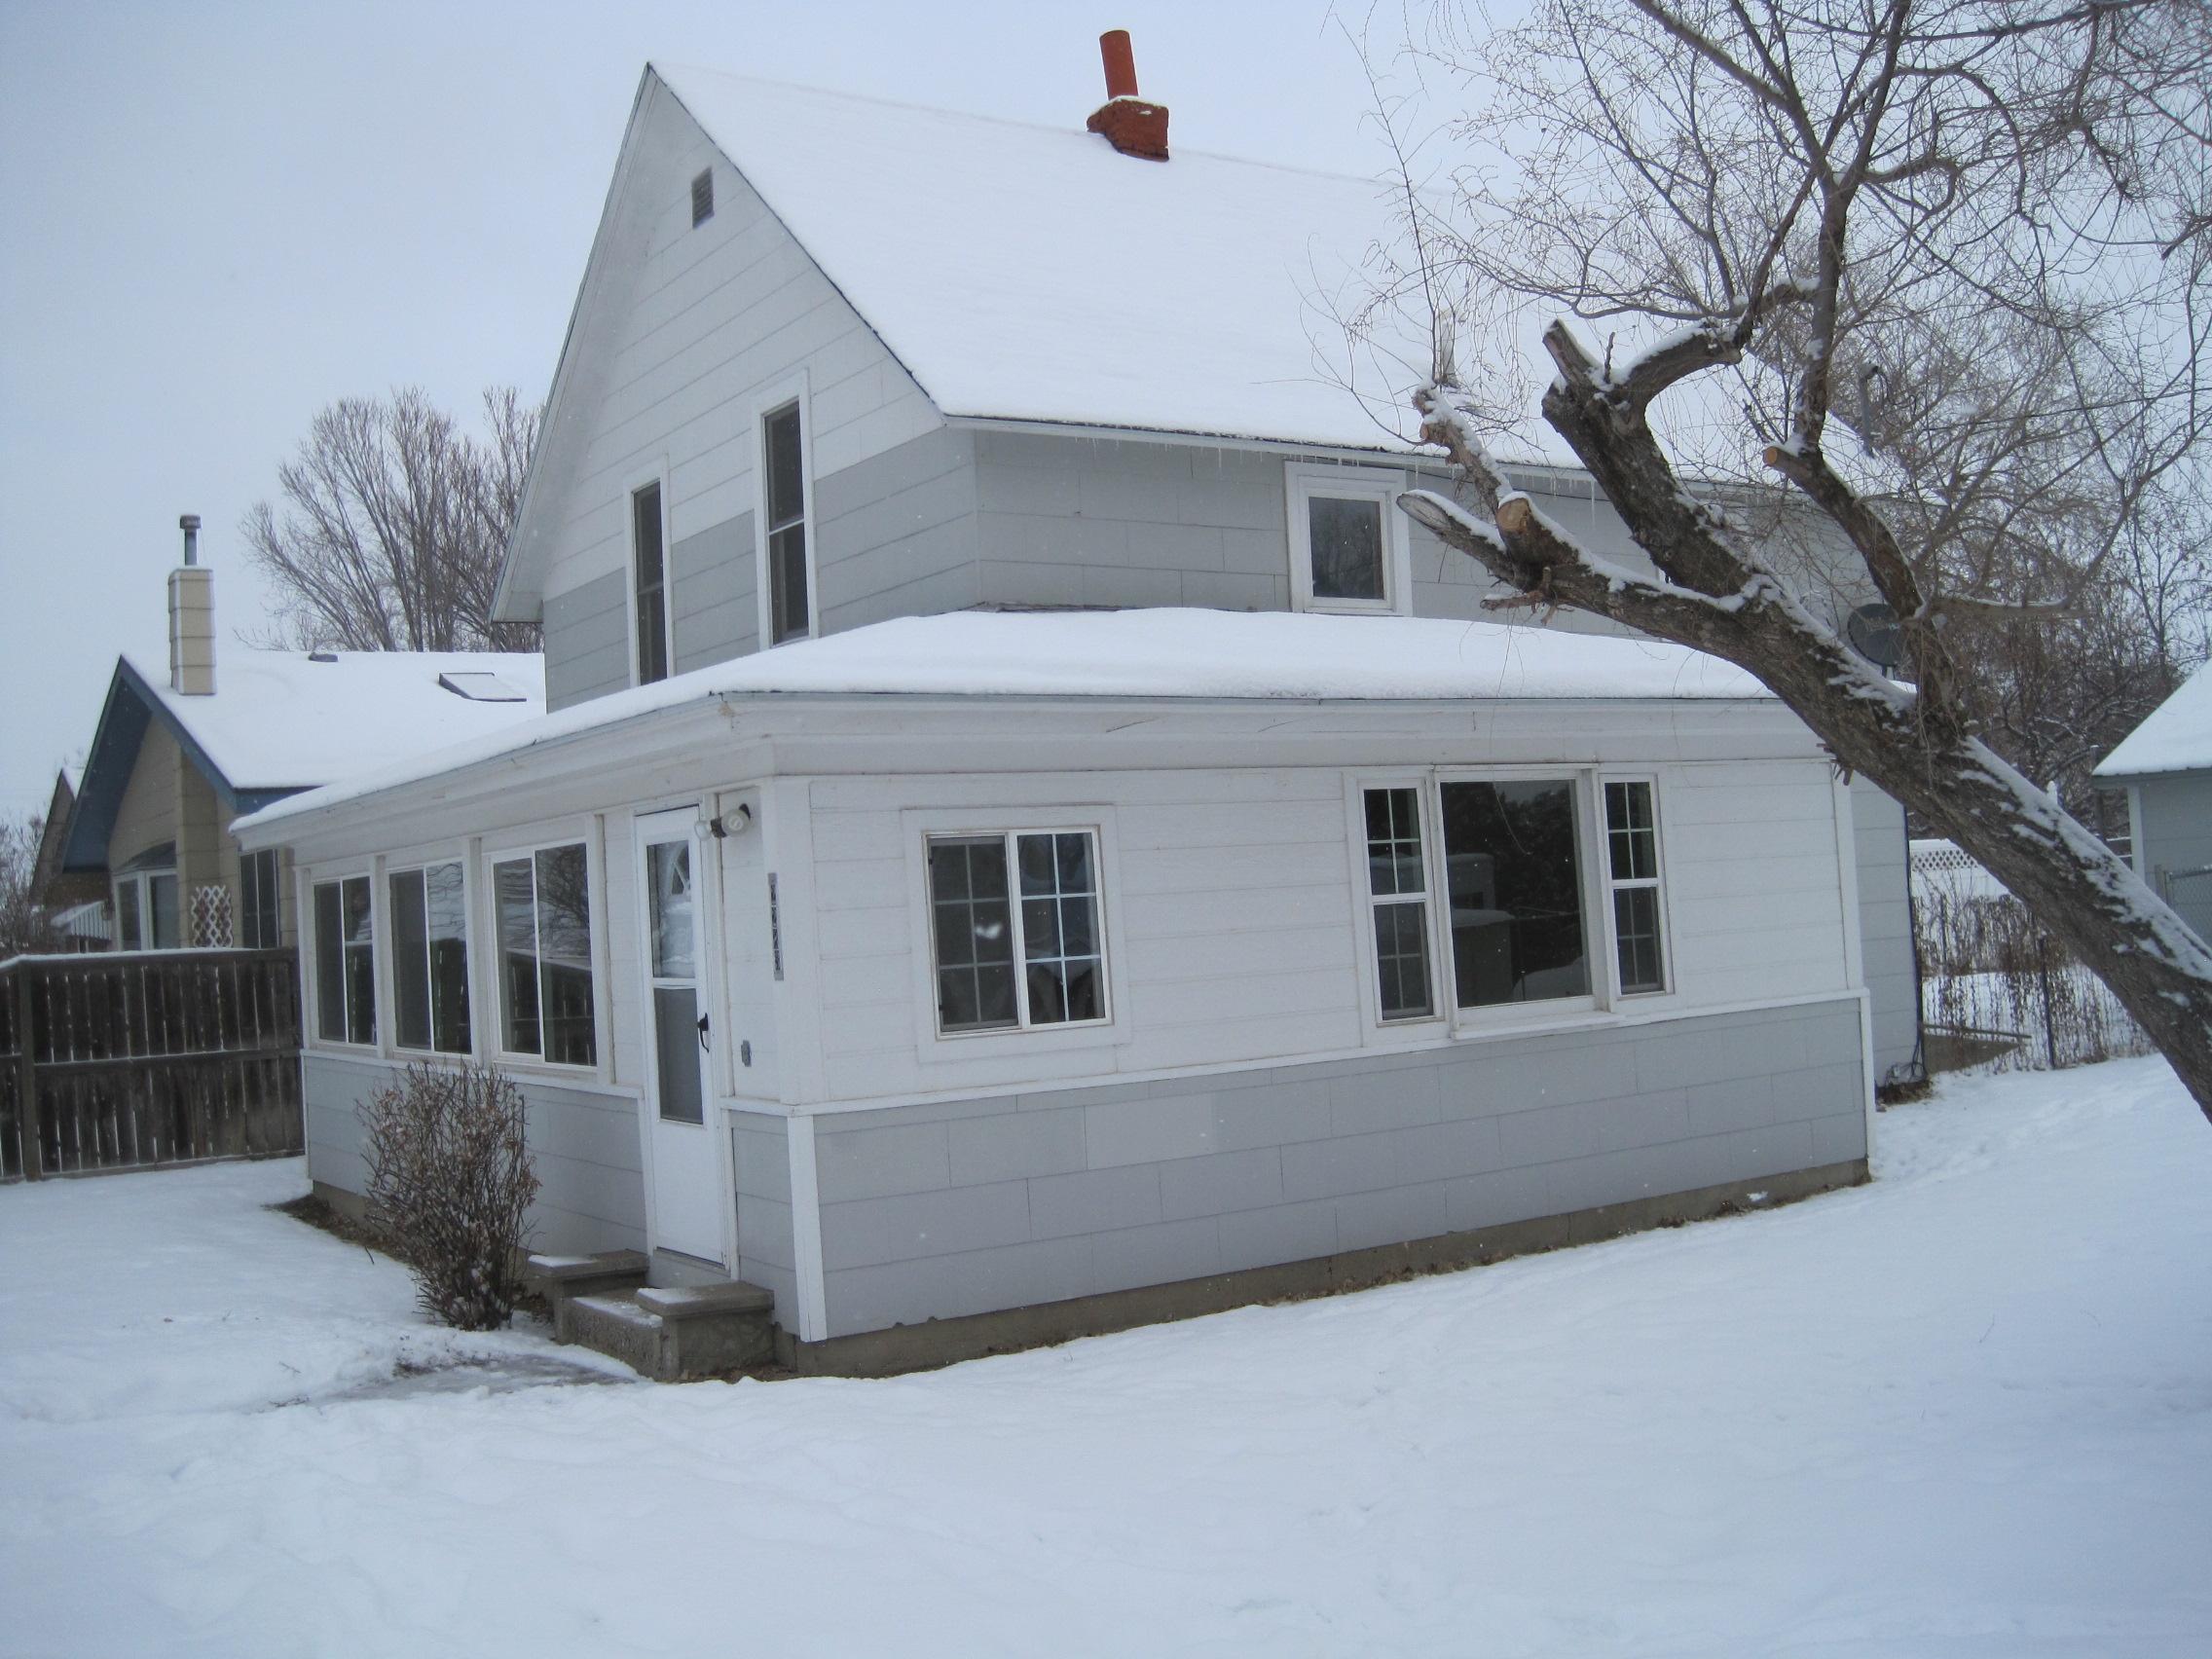 2283 1st St W, Ballantine, Montana 59006